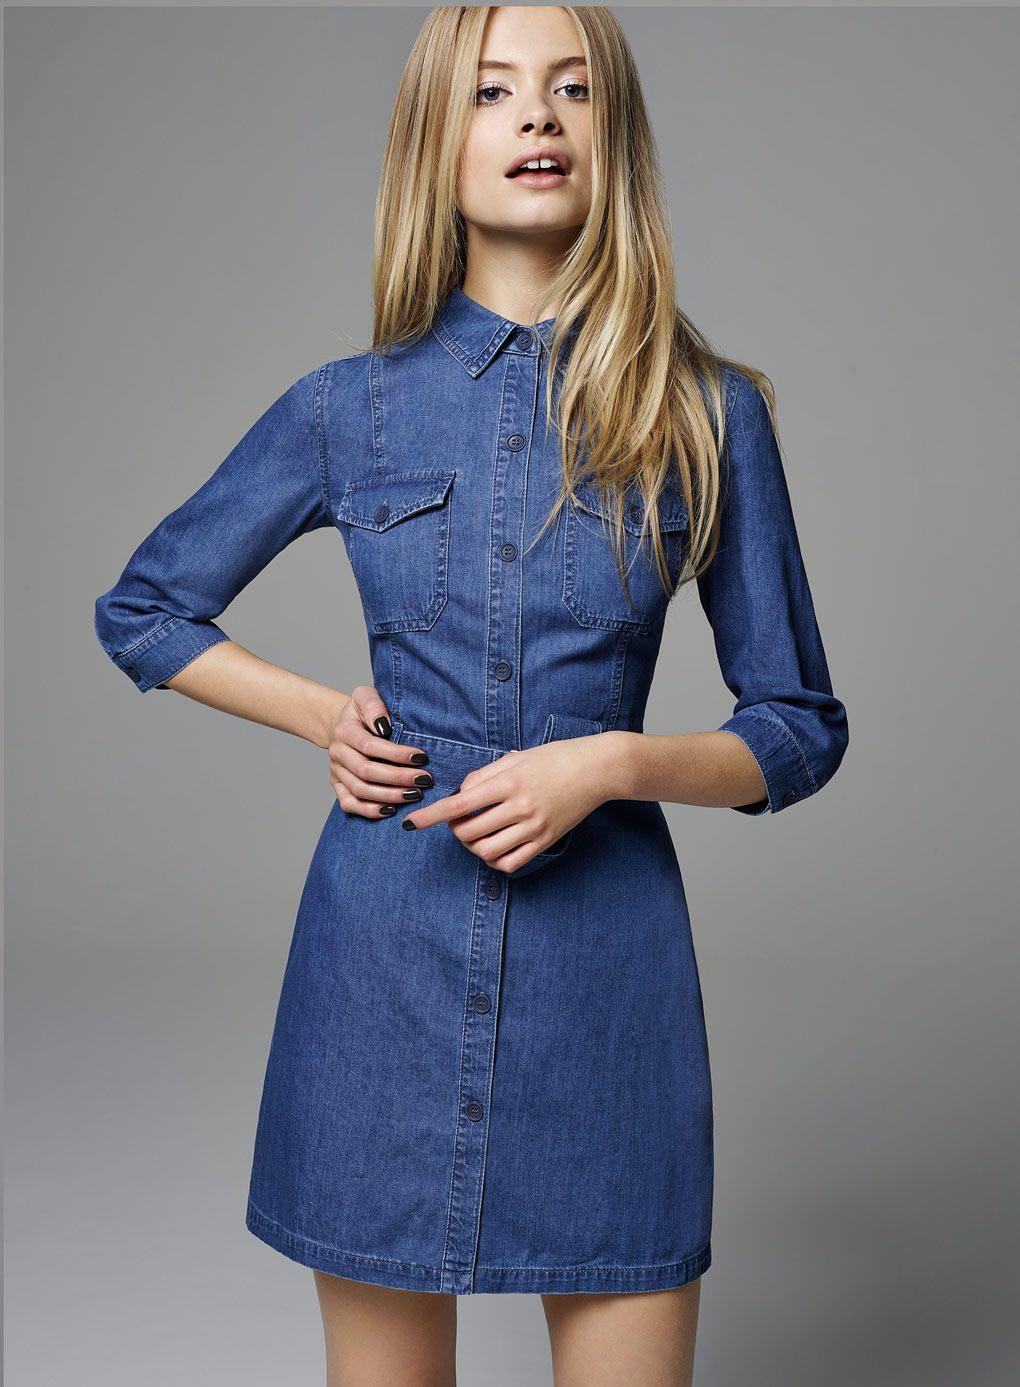 e58b5016987 Utility Denim Shirt Dress - Miss Selfridge from Miss Selfridge. Saved to  Things I want as gifts